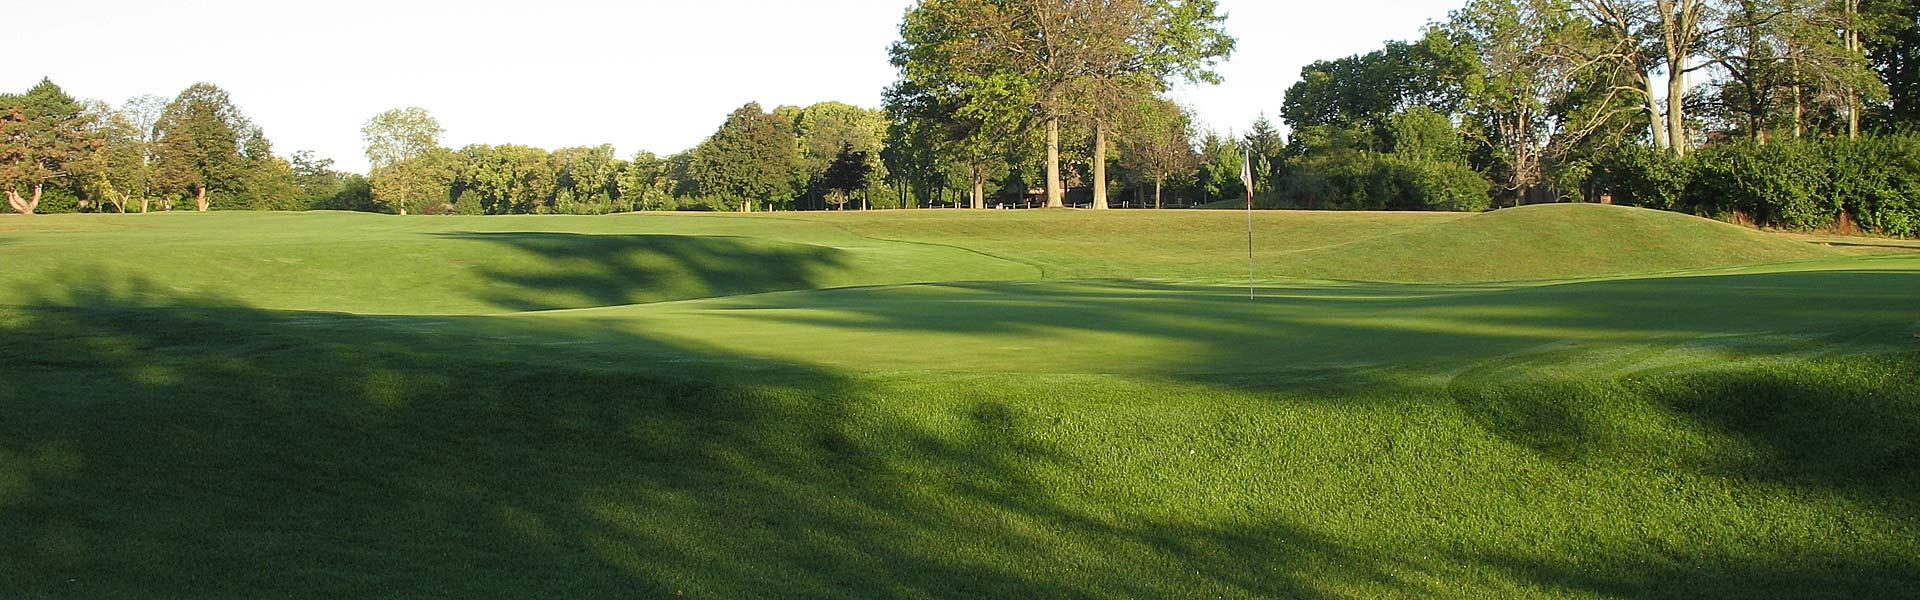 26+ Cassel hills golf course tee times information